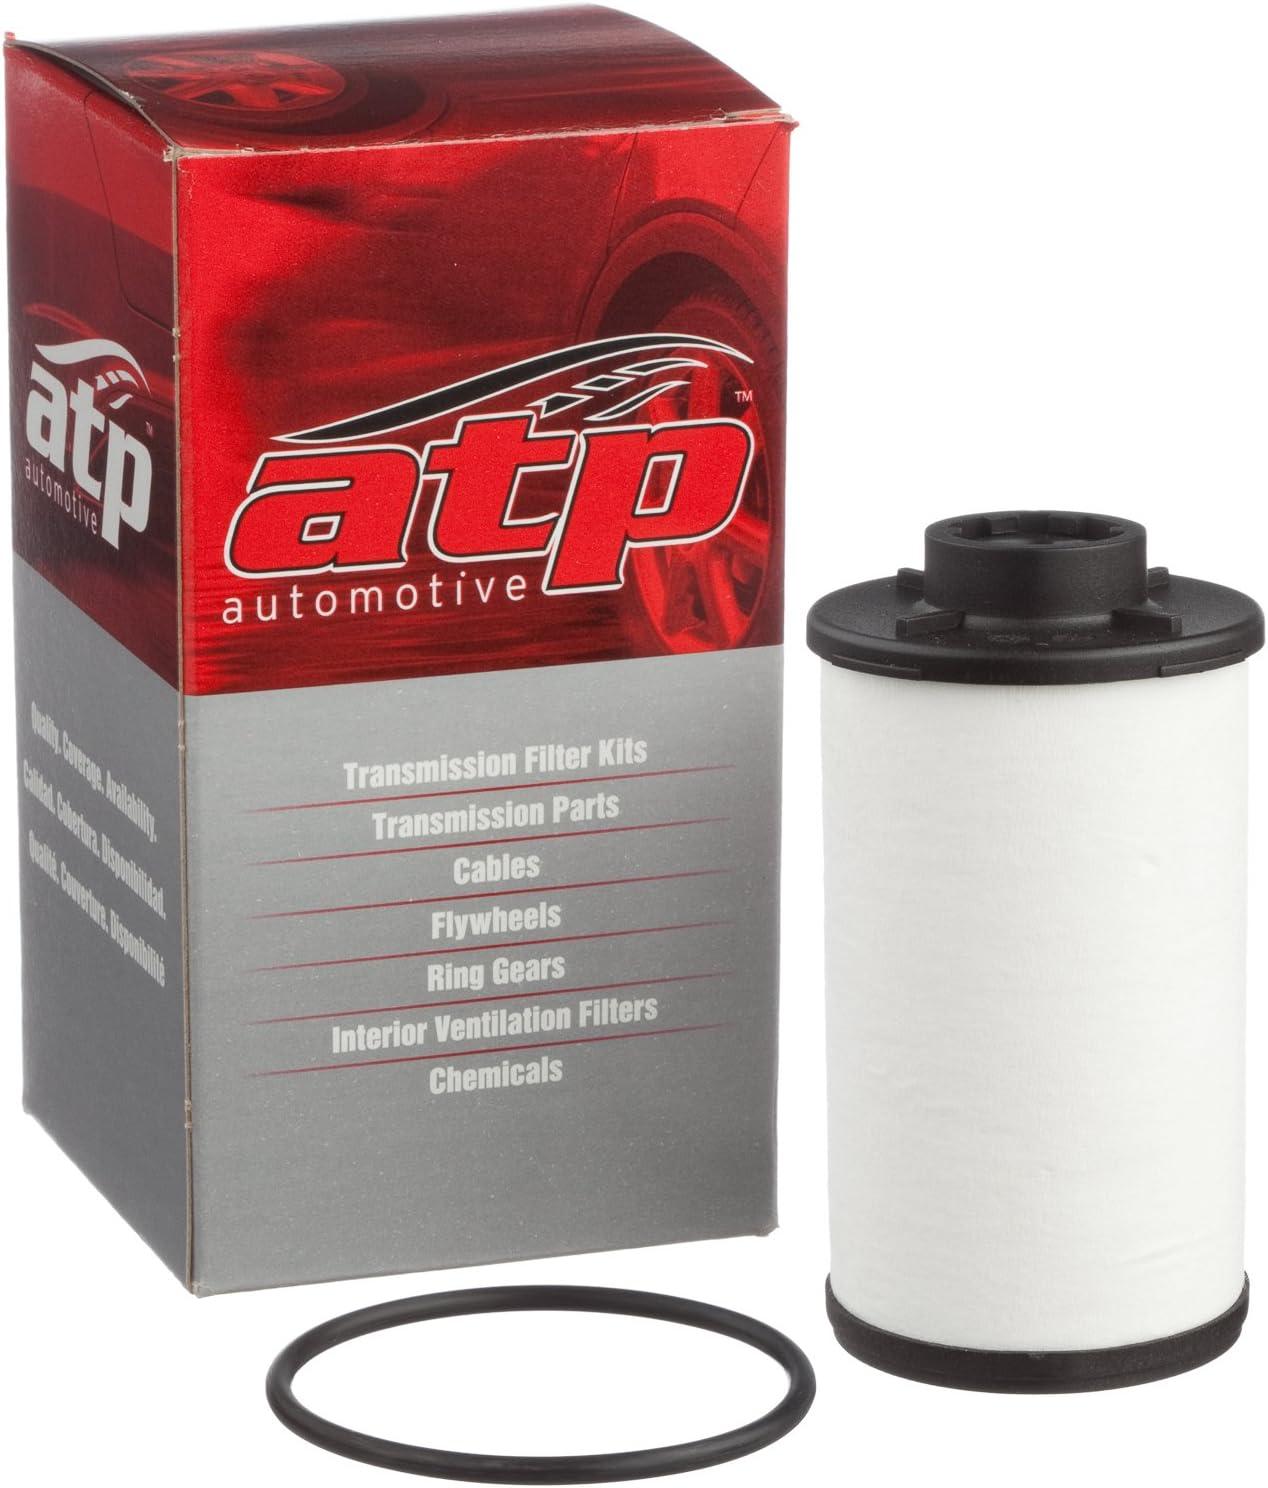 ATP B-455 Automatic Transmission Filter